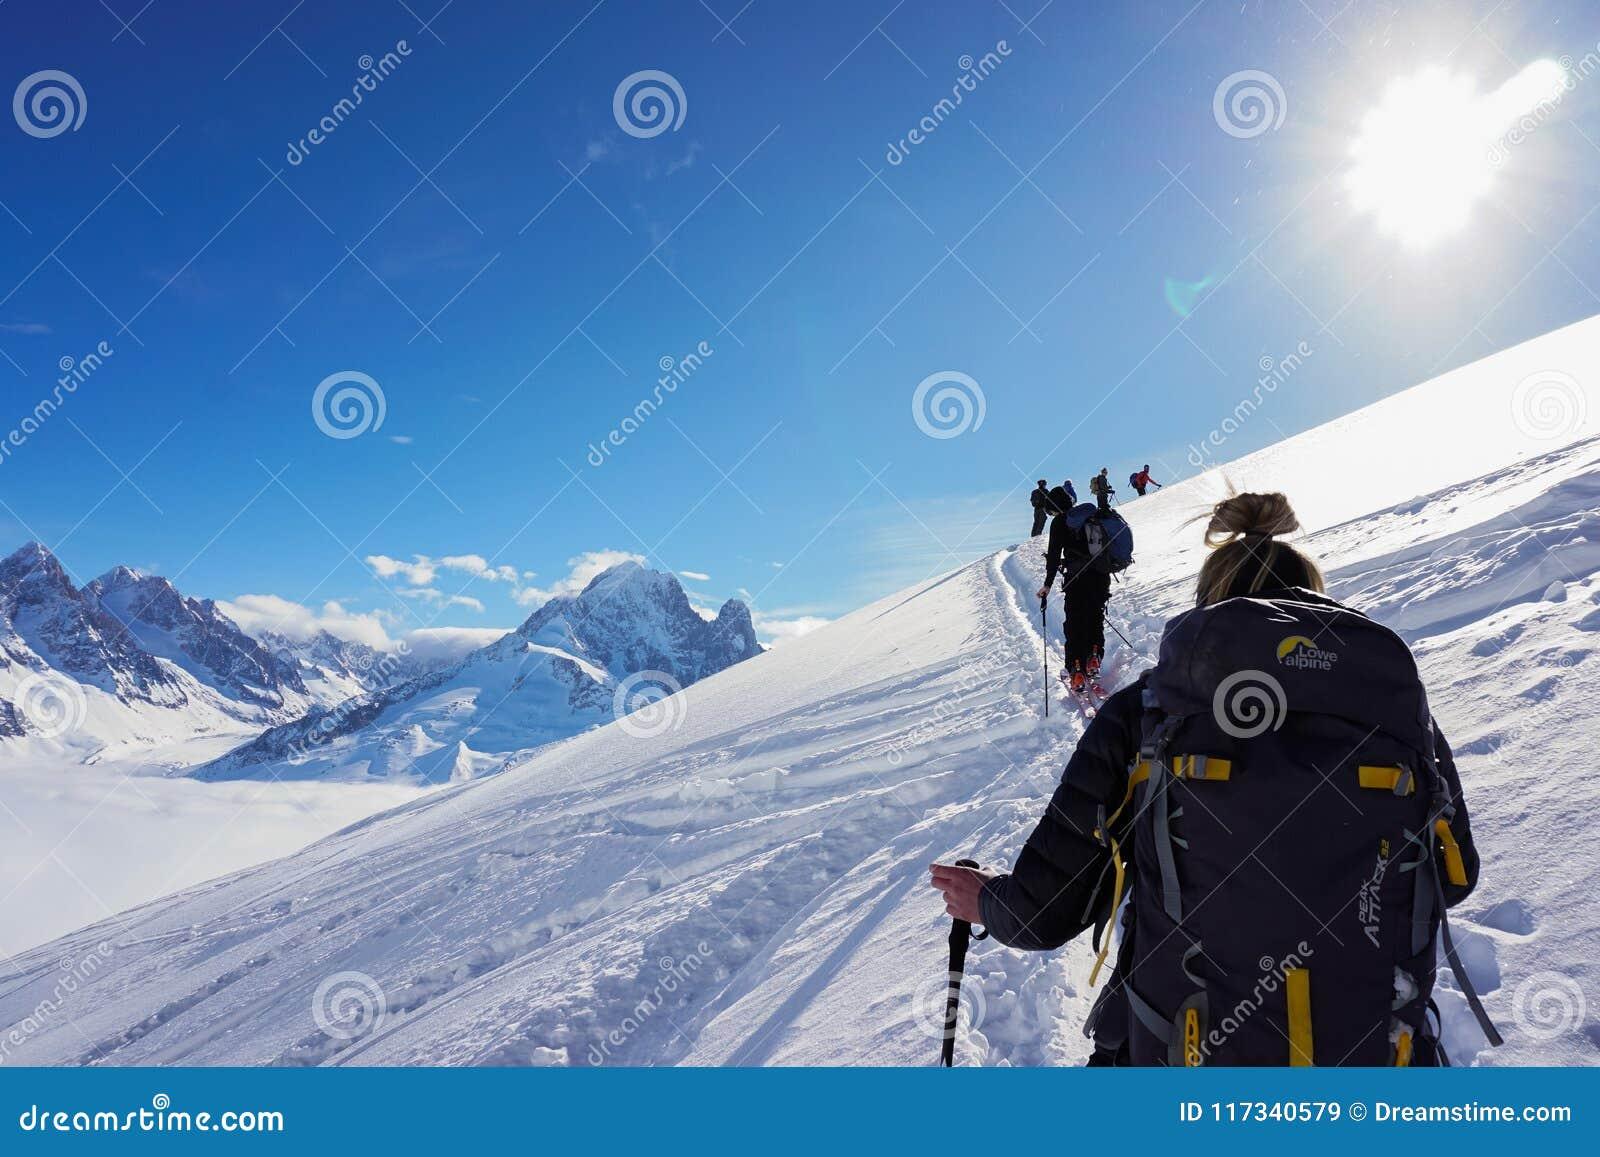 Mountain View à Chamonix tandis que Ski Touring